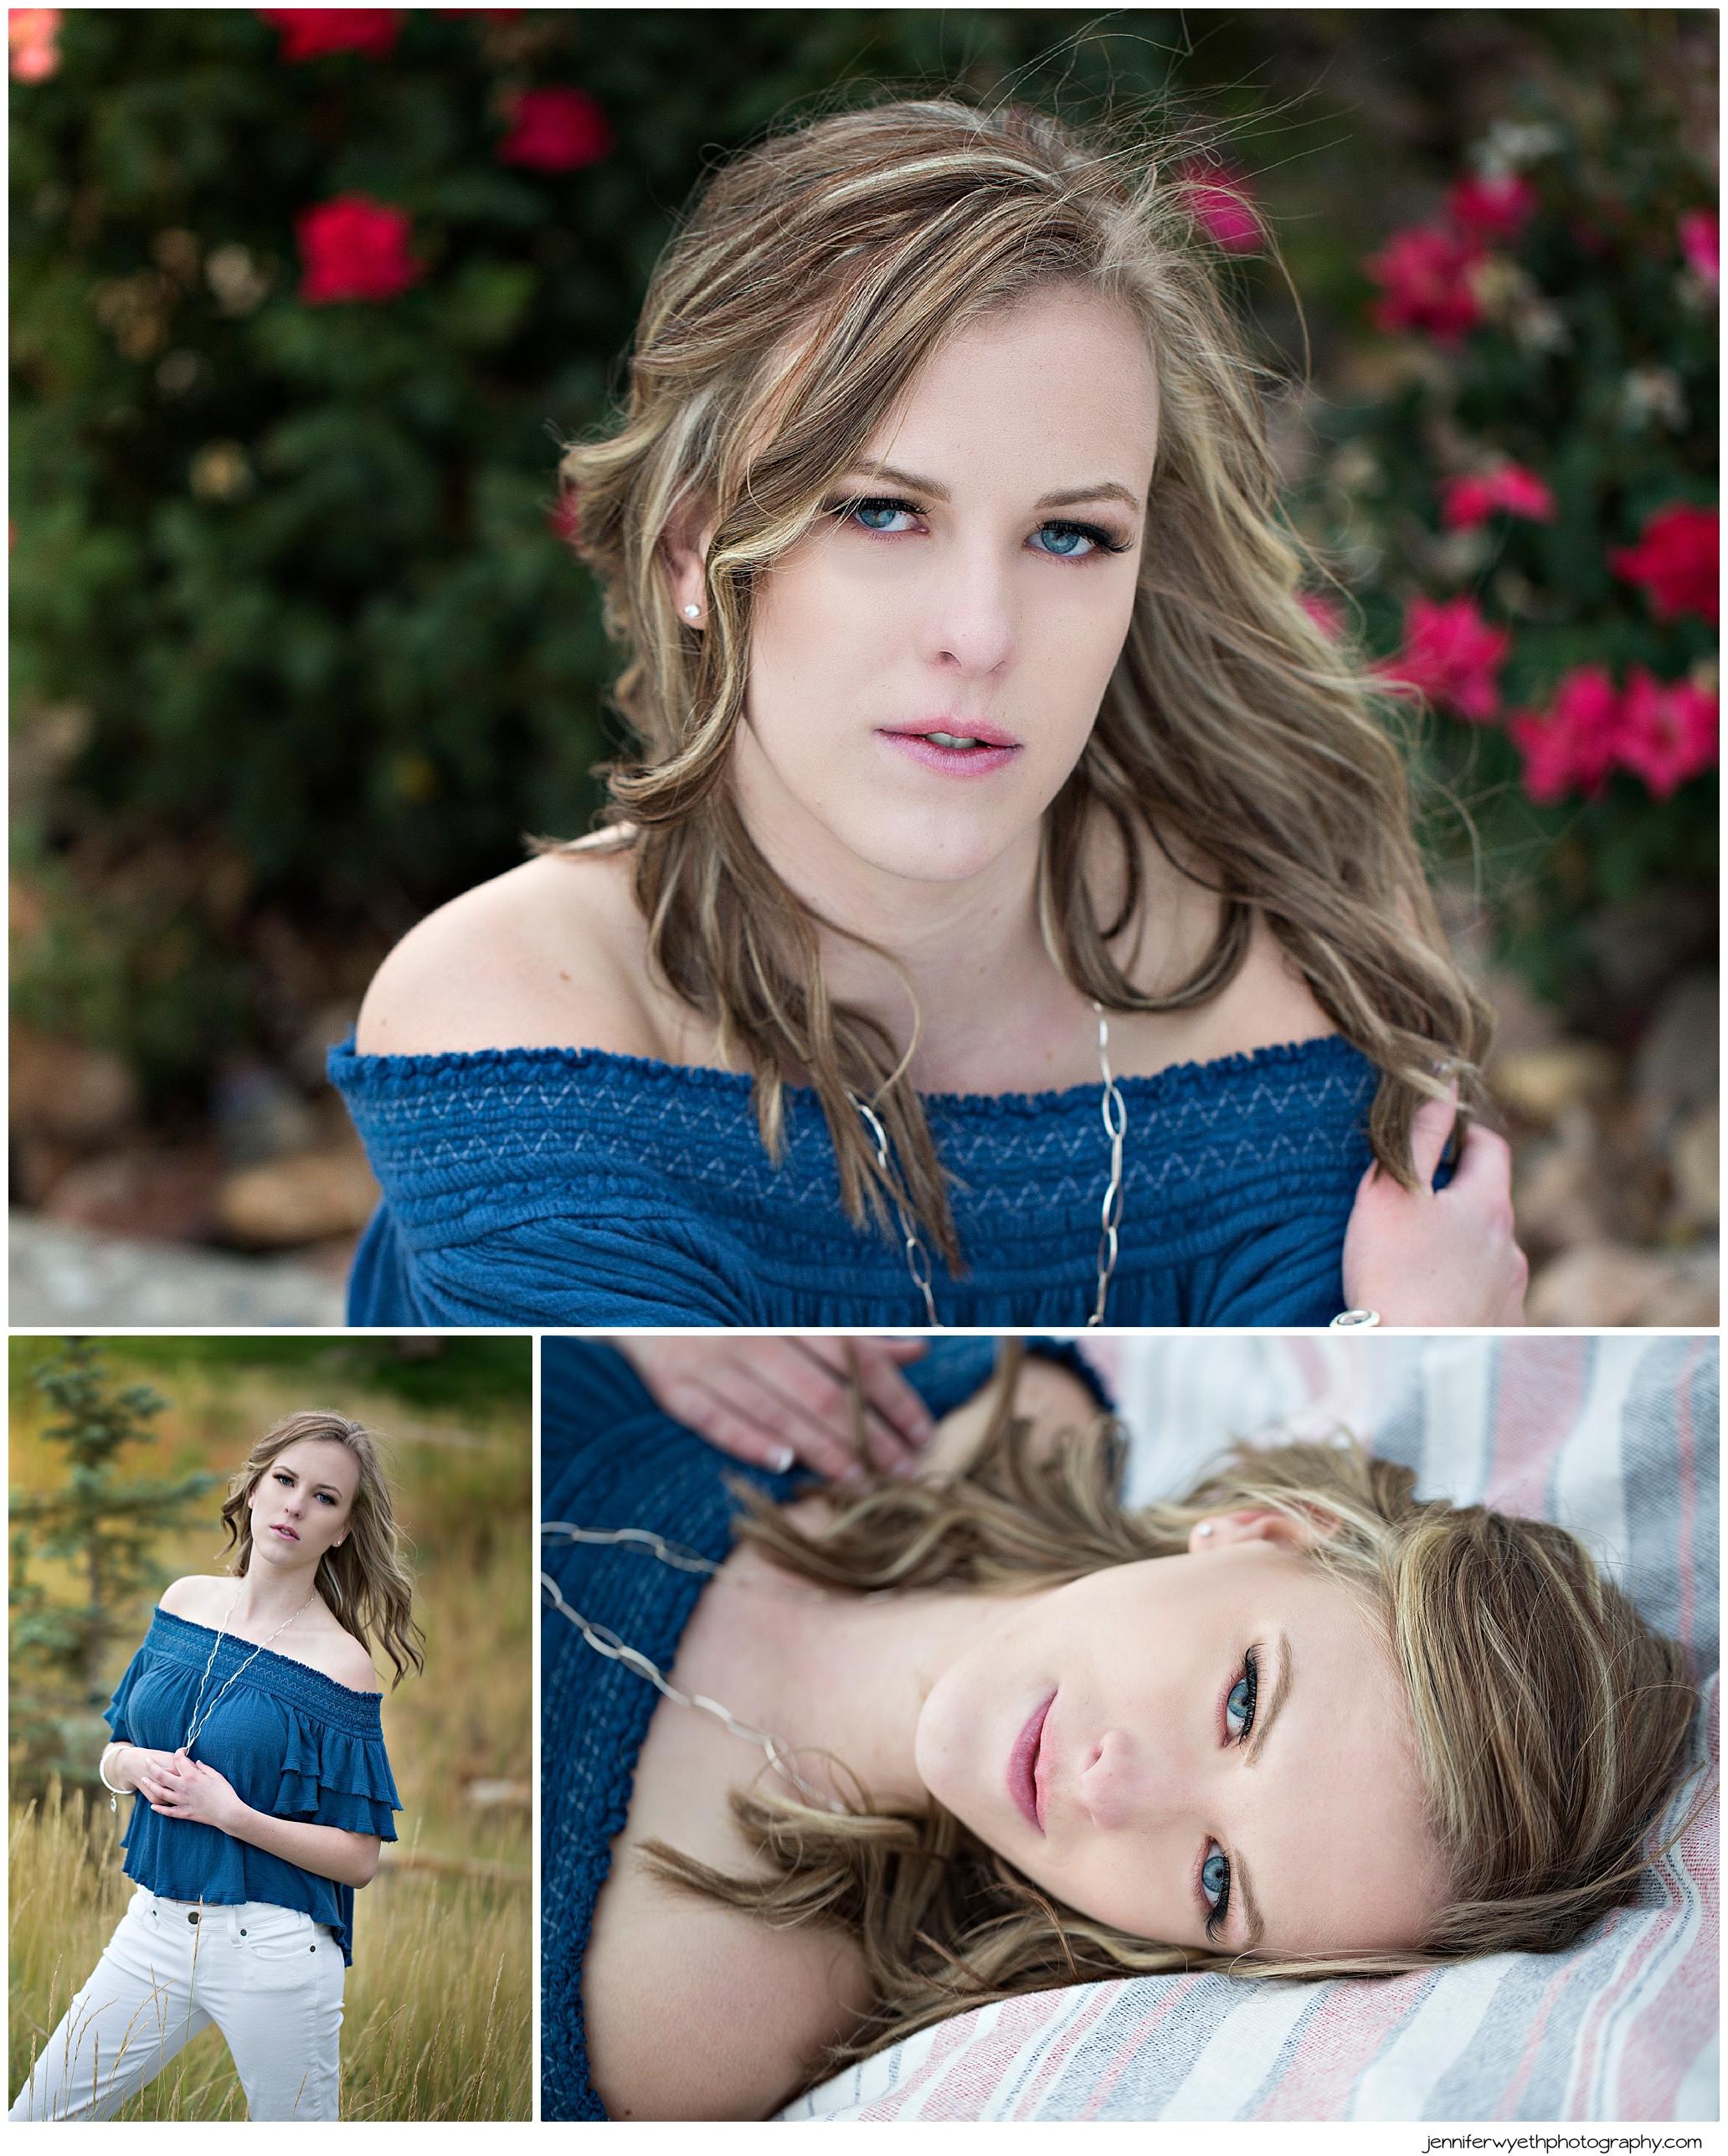 Jennifer-Wyeth-photography-senior-pictures-colorado-springs-photographer_0196.jpg